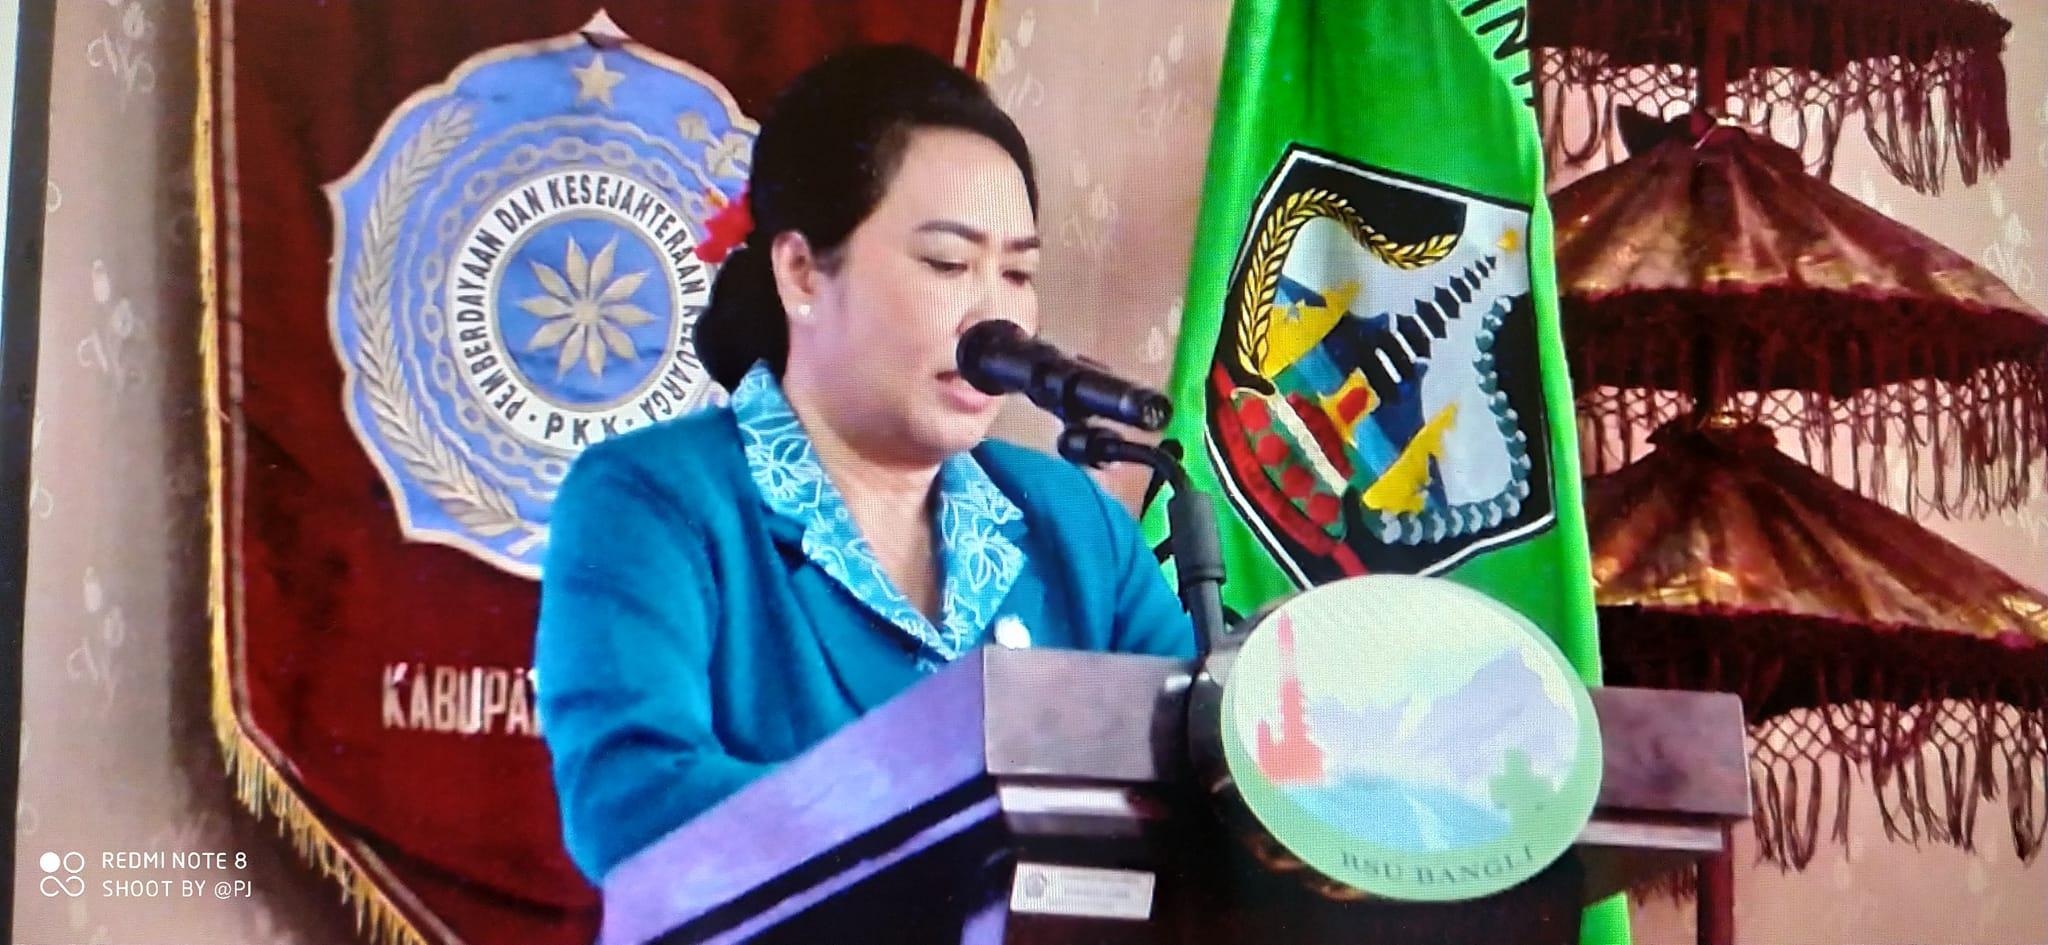 Pengarahan secara umum oleh Ketua TP PKK Kabupaten Bangli Ny. Sariasih Sedana Arta dalam rangka Rapat Konsultasi  TP PKK Kab. Bangli